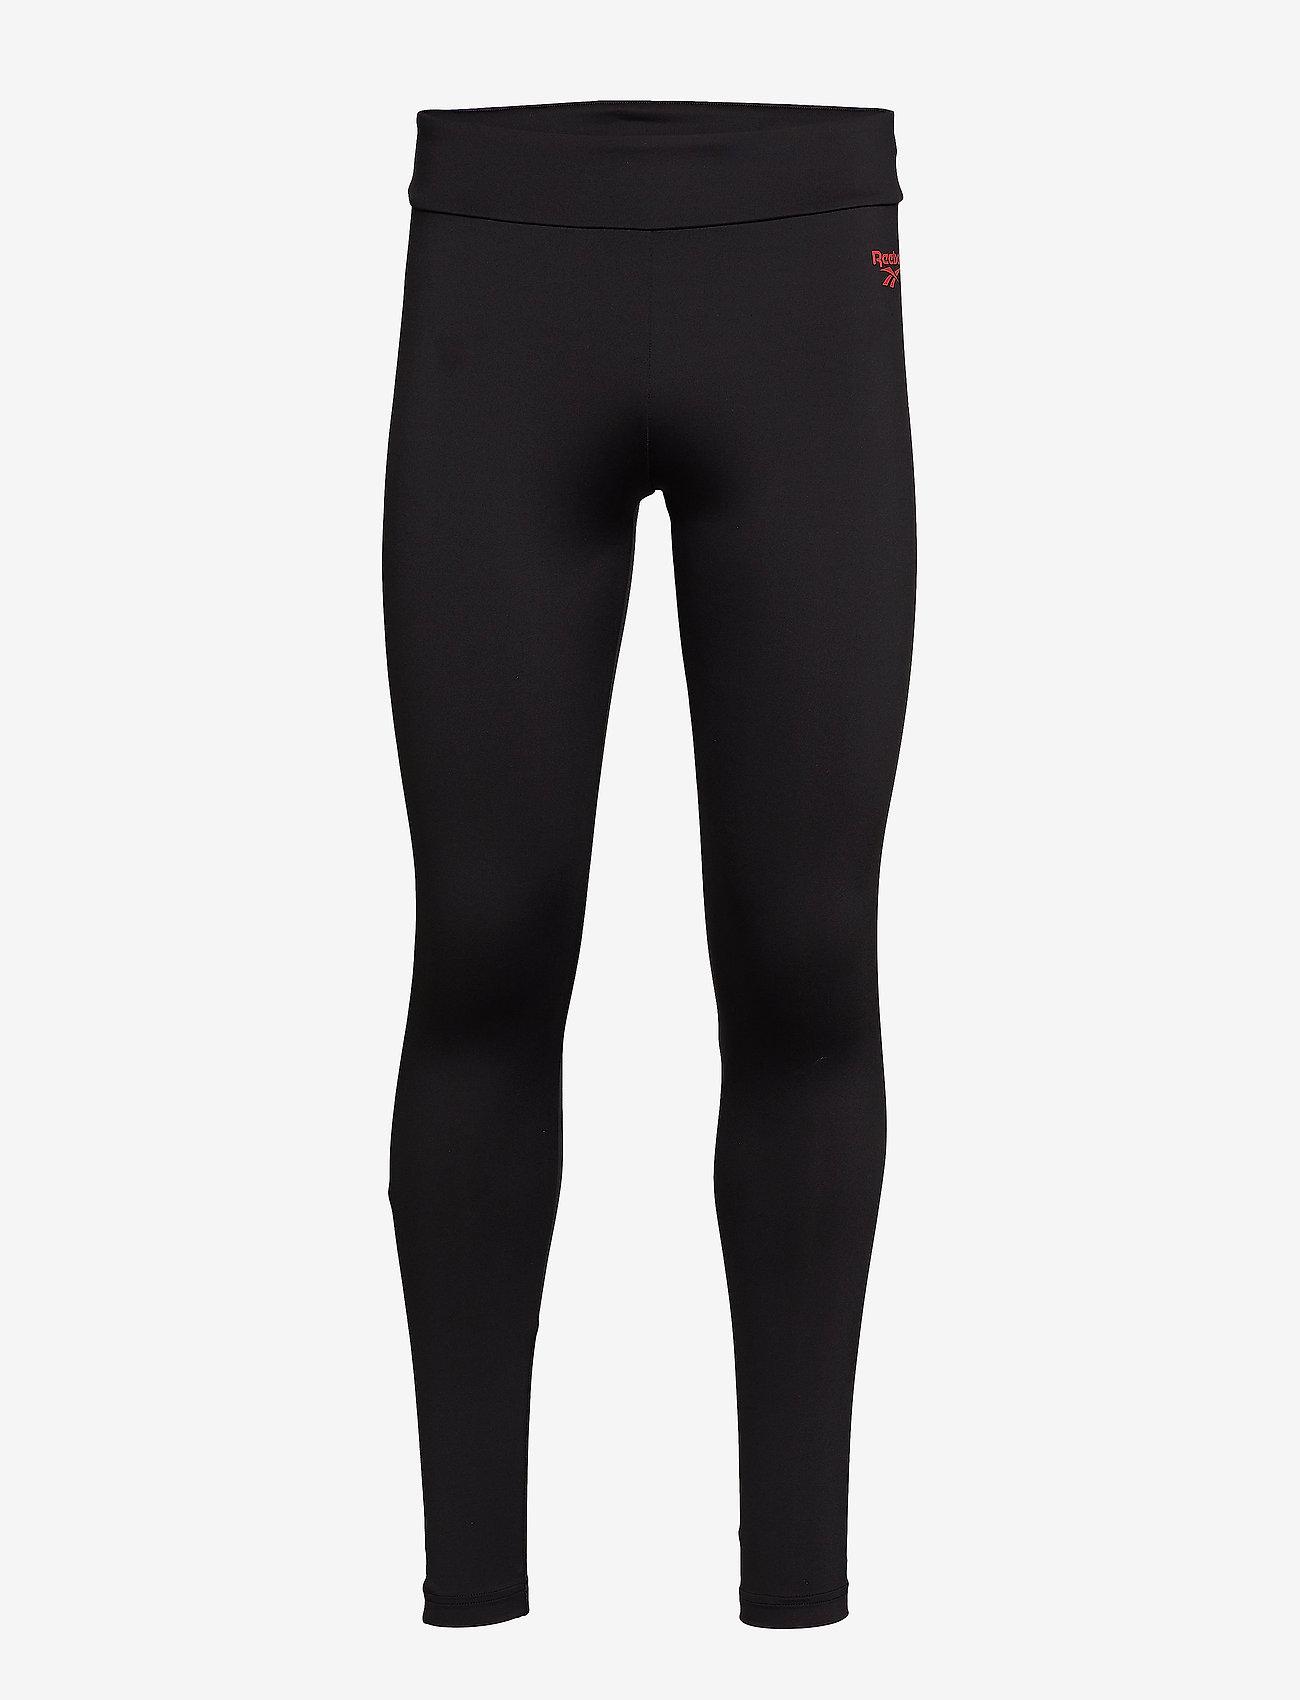 Reebok Classics - CL GP LEGGING - leggings - black - 1